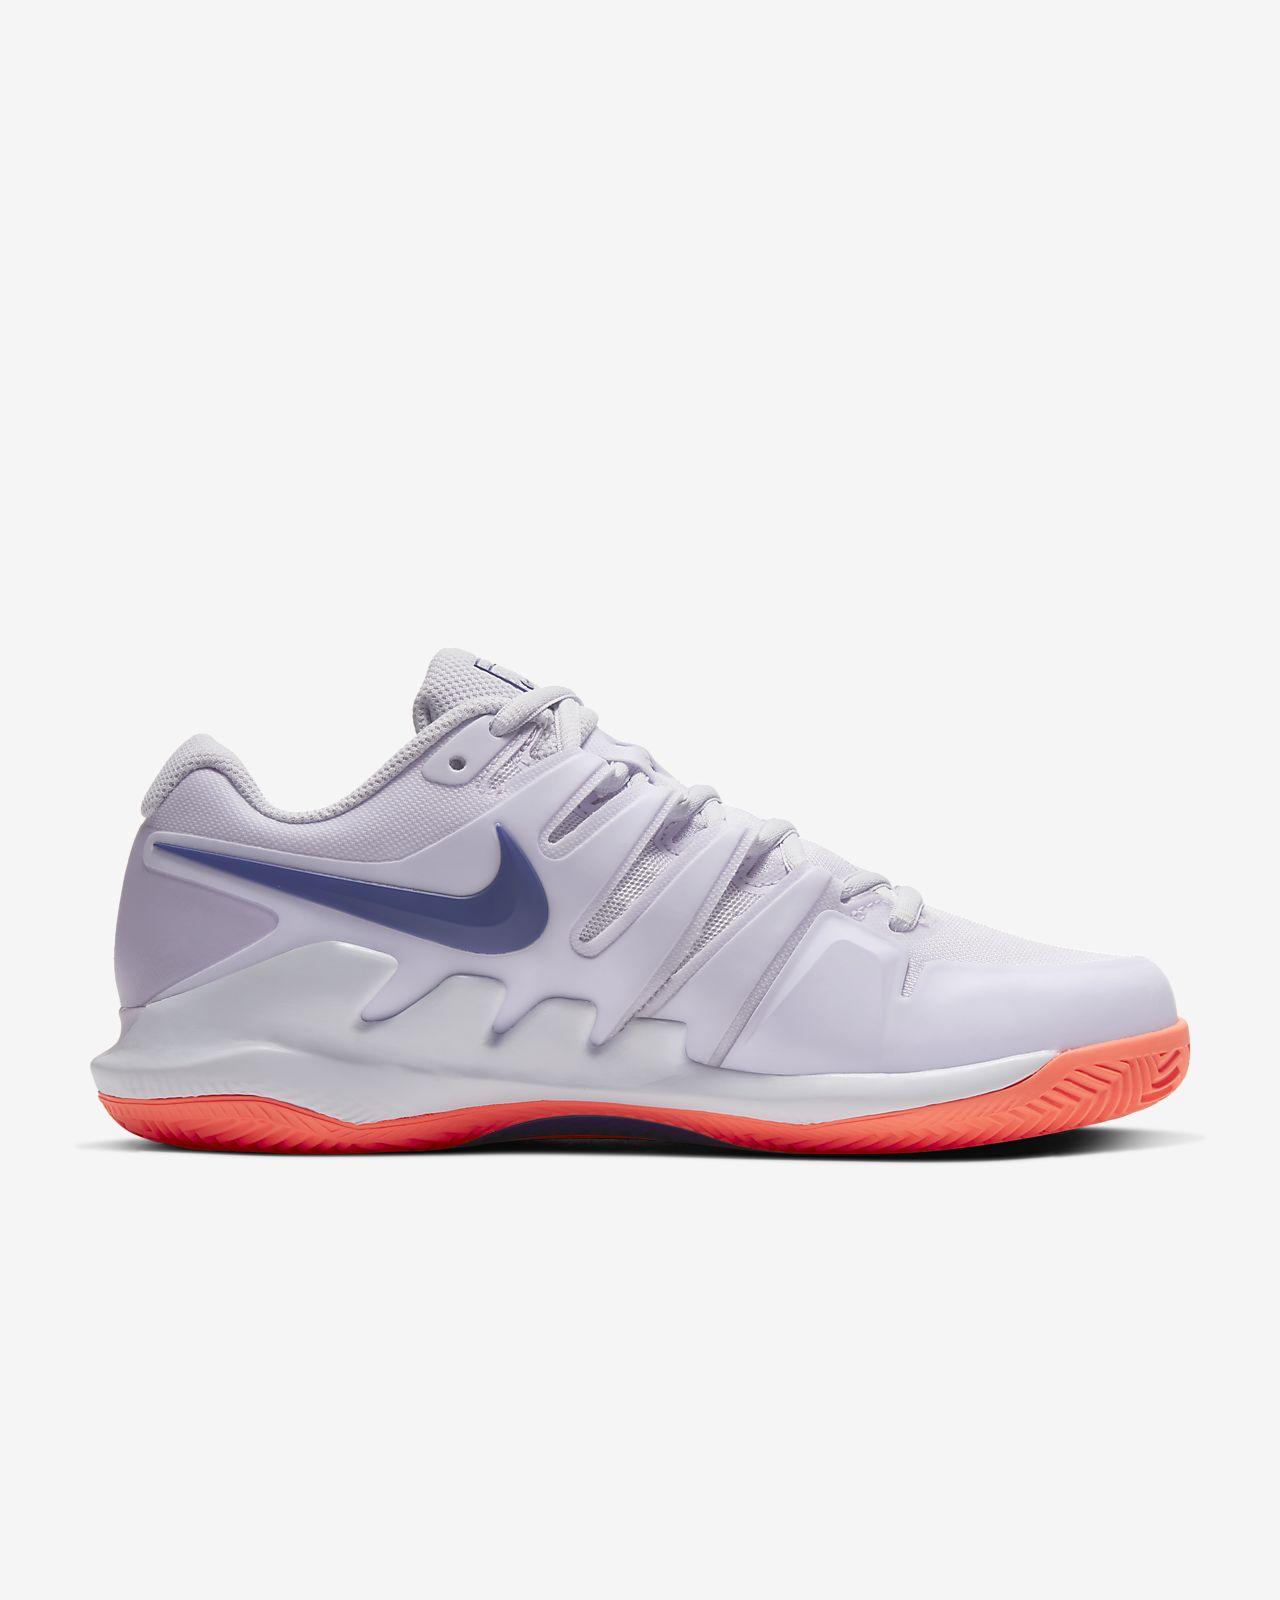 chaussures tennis nike femme terre battue